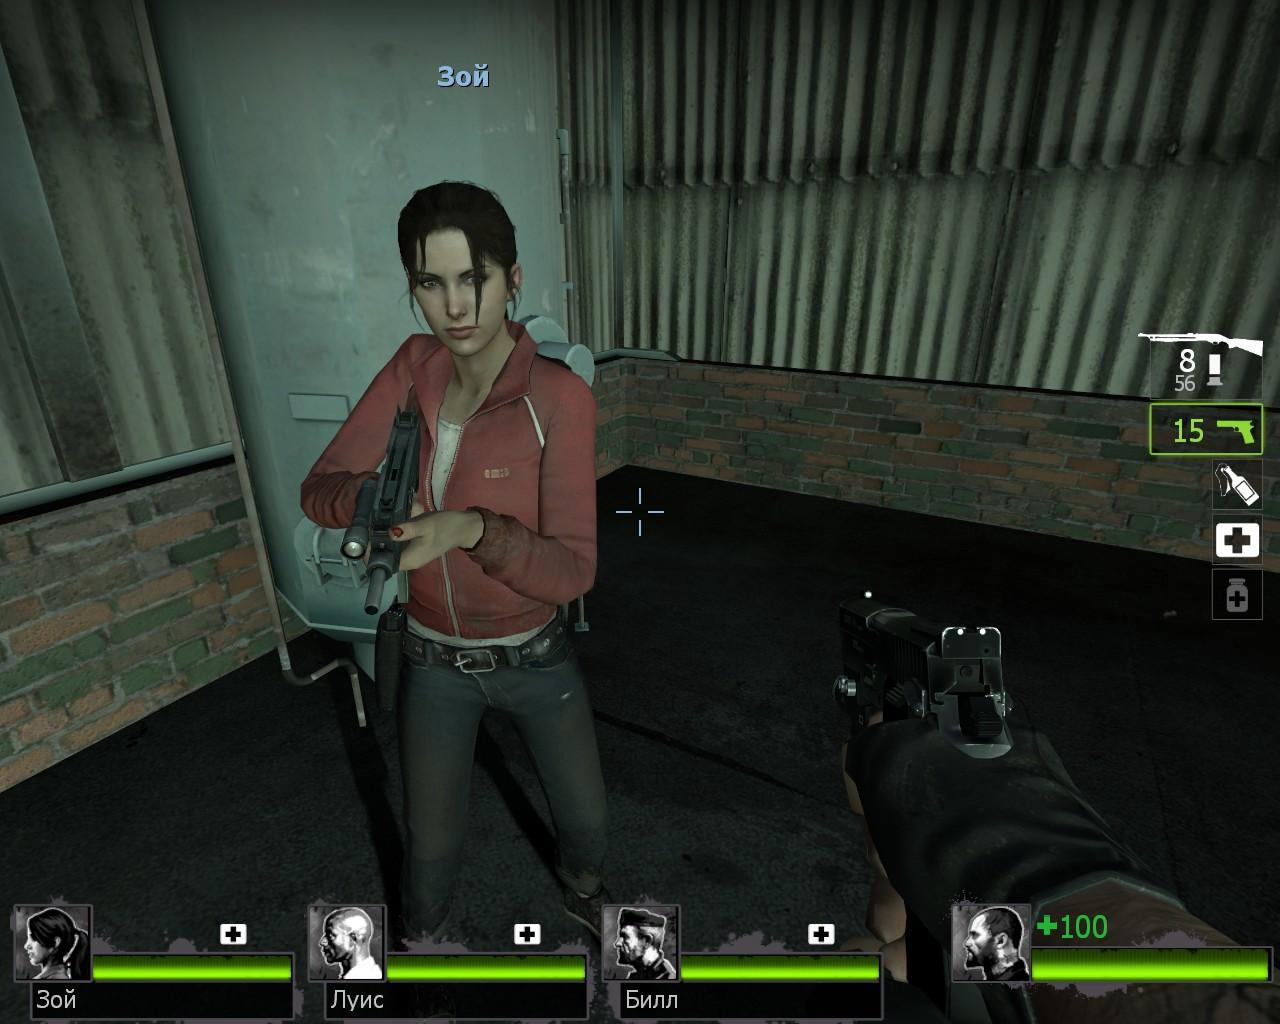 Left 4 Dead 2 Билл Навсегда! - Файлы - патч, демо, demo